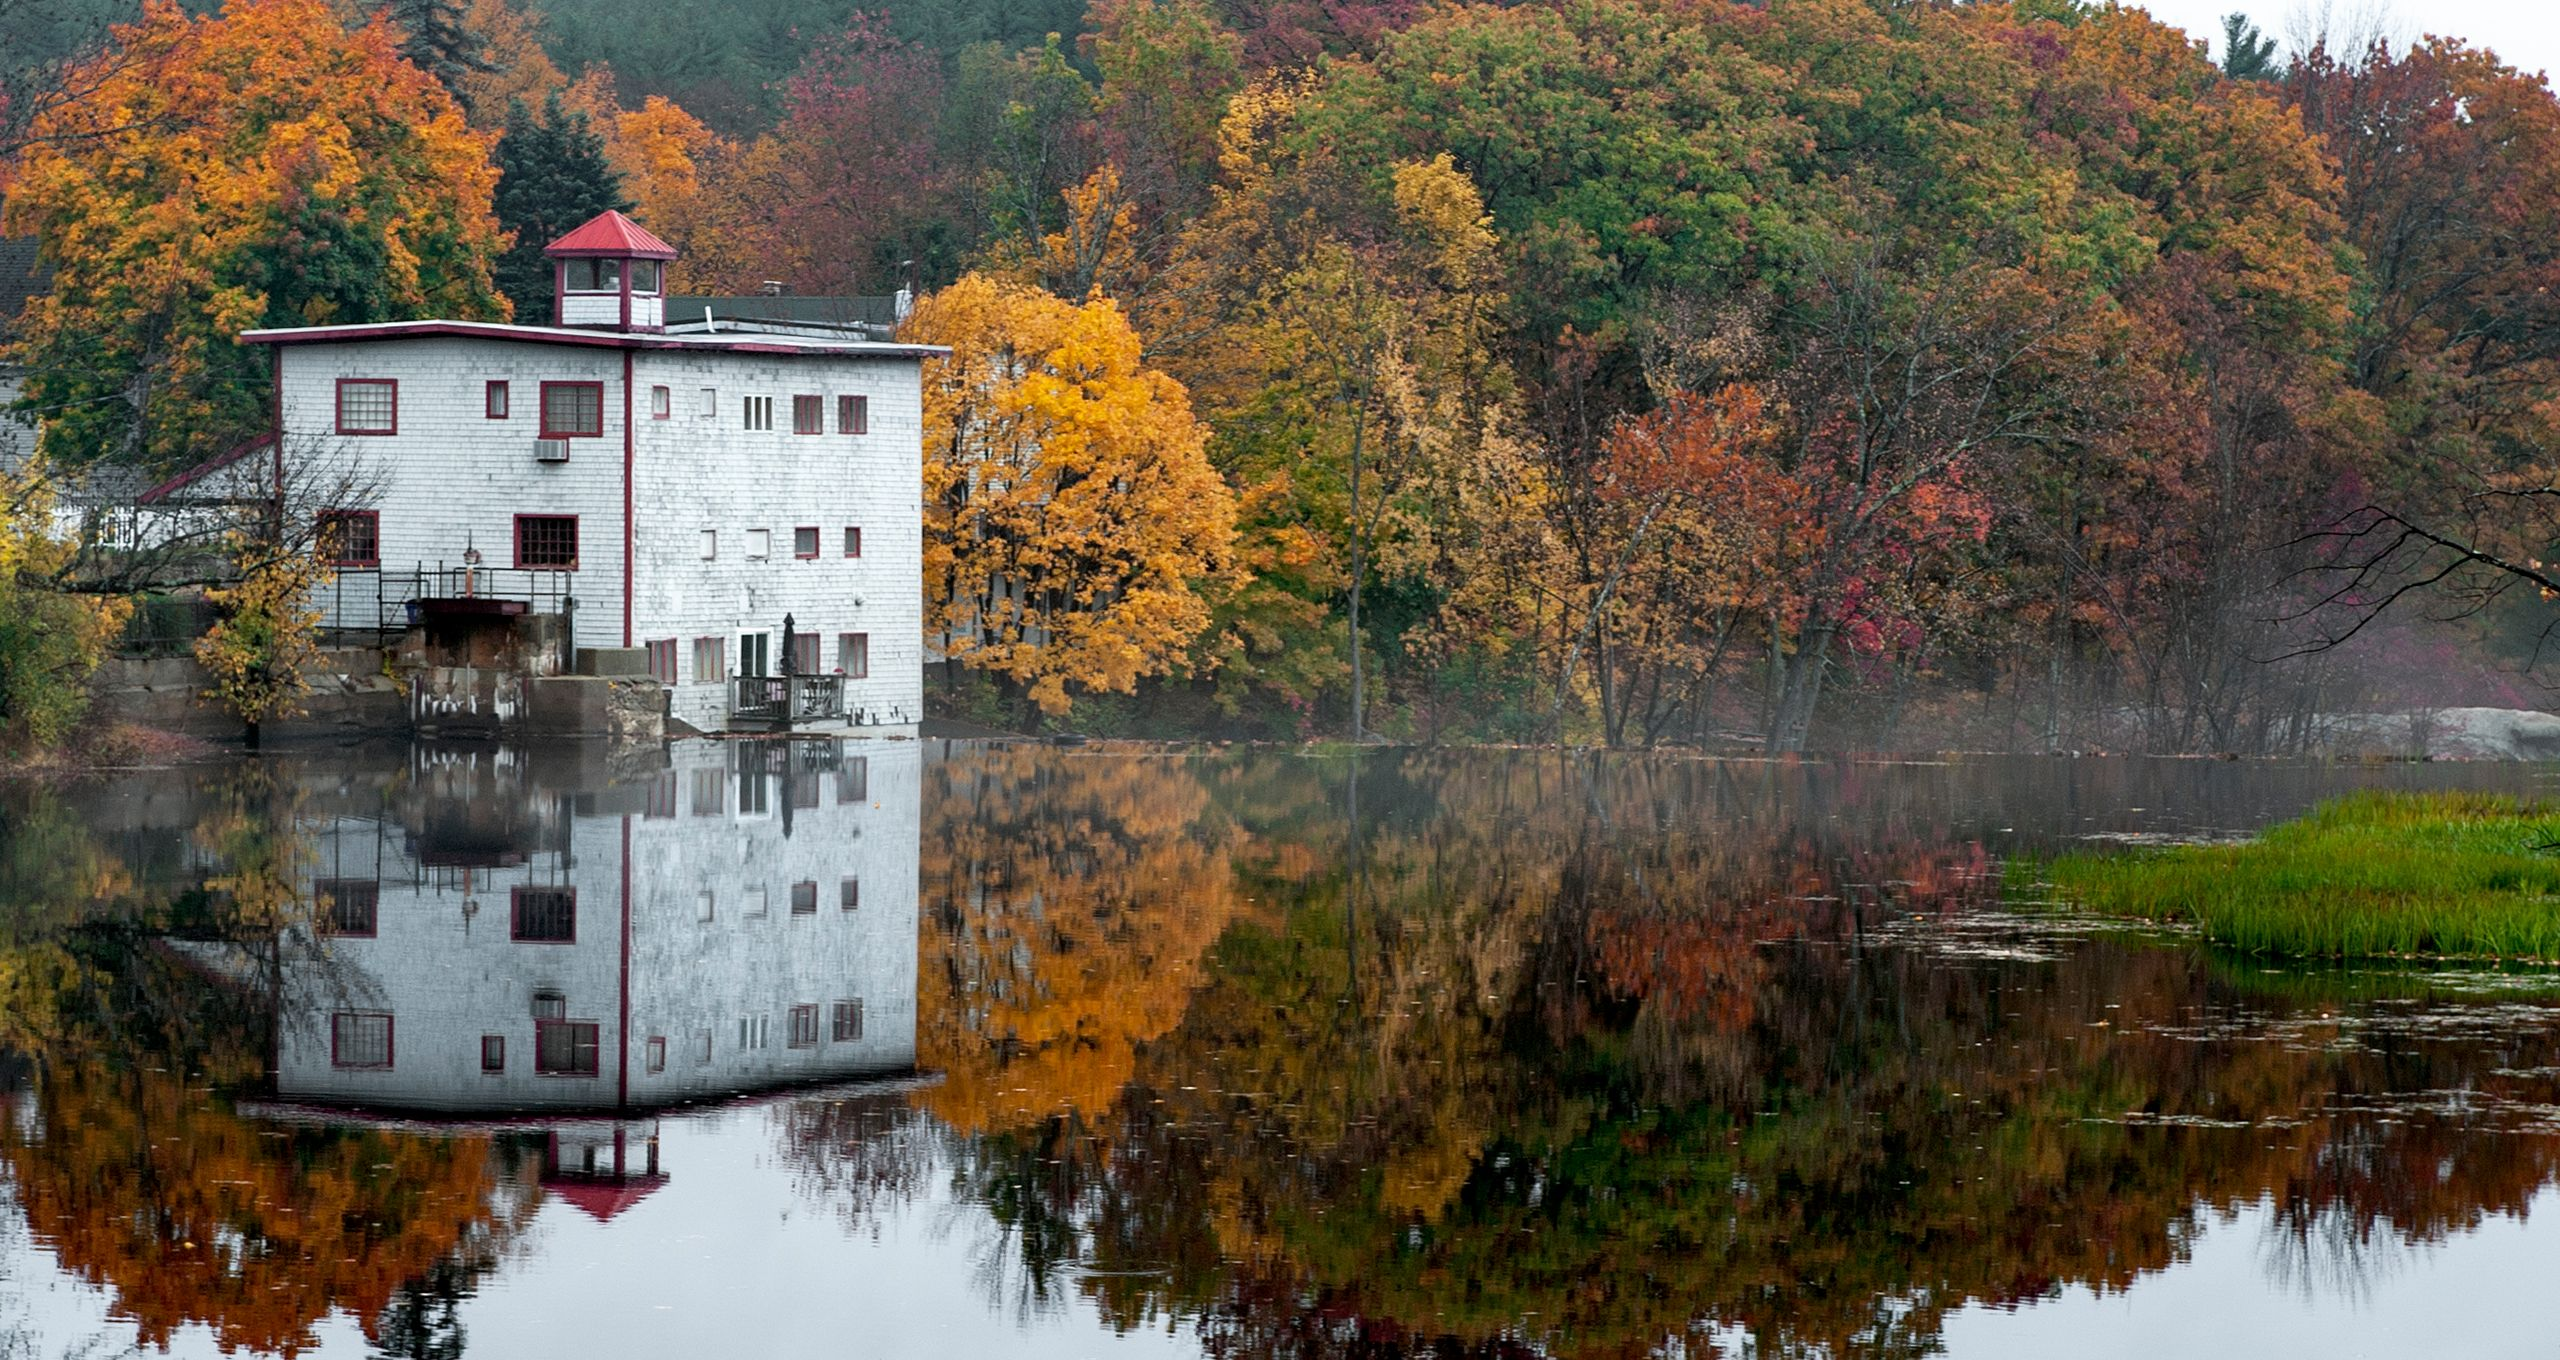 Building on Still Lake in Fall